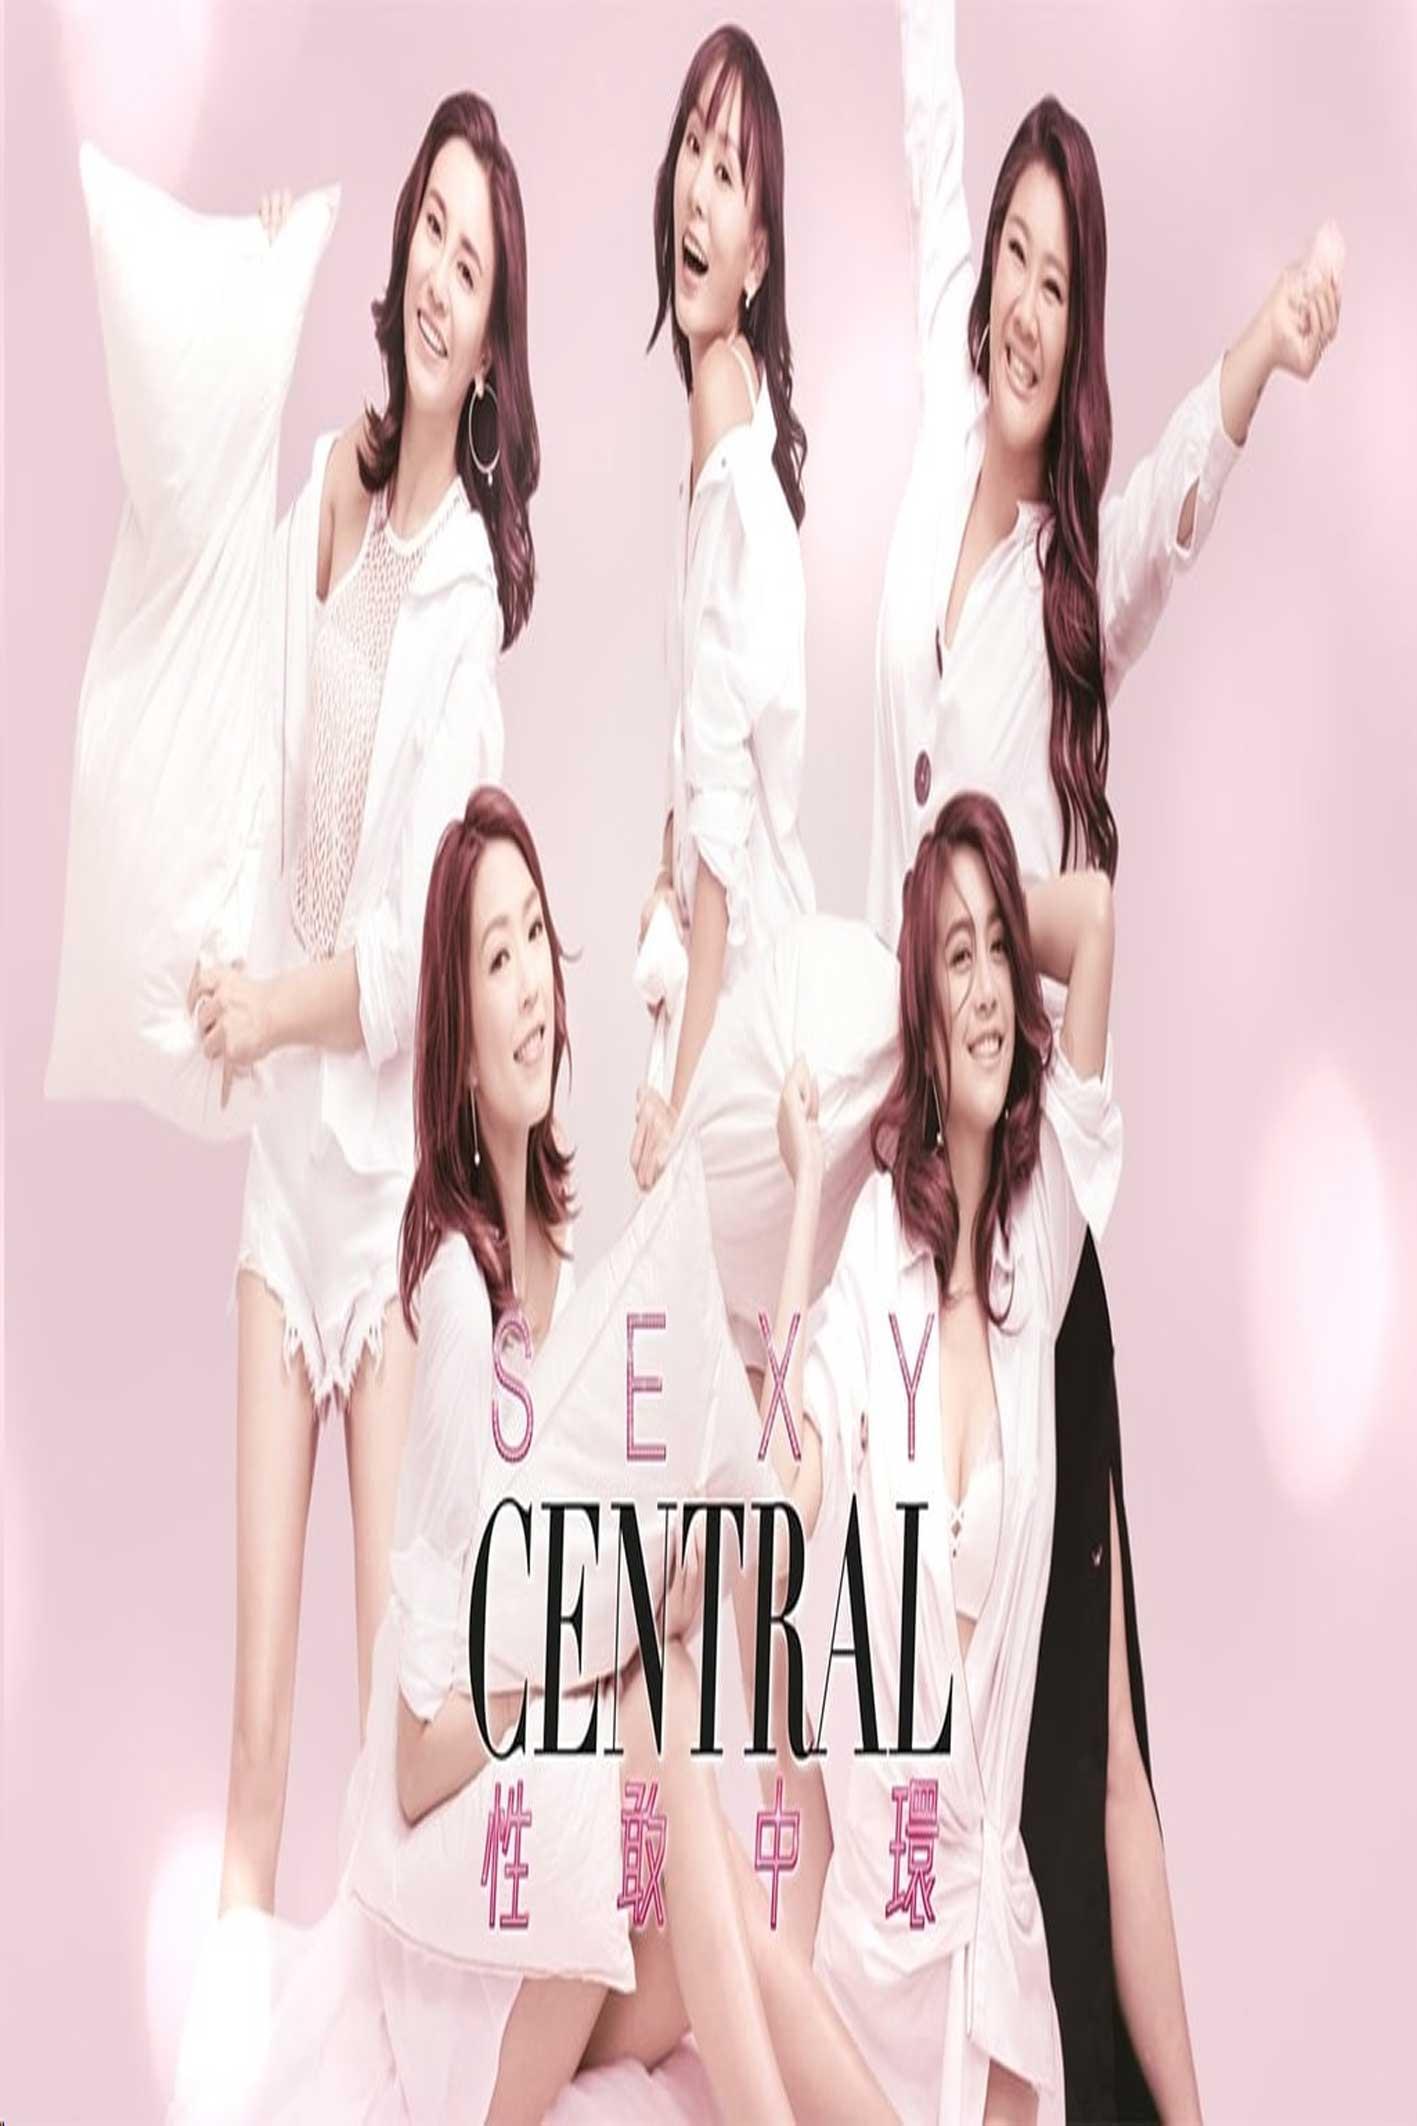 Sexy Central - 性敢中環